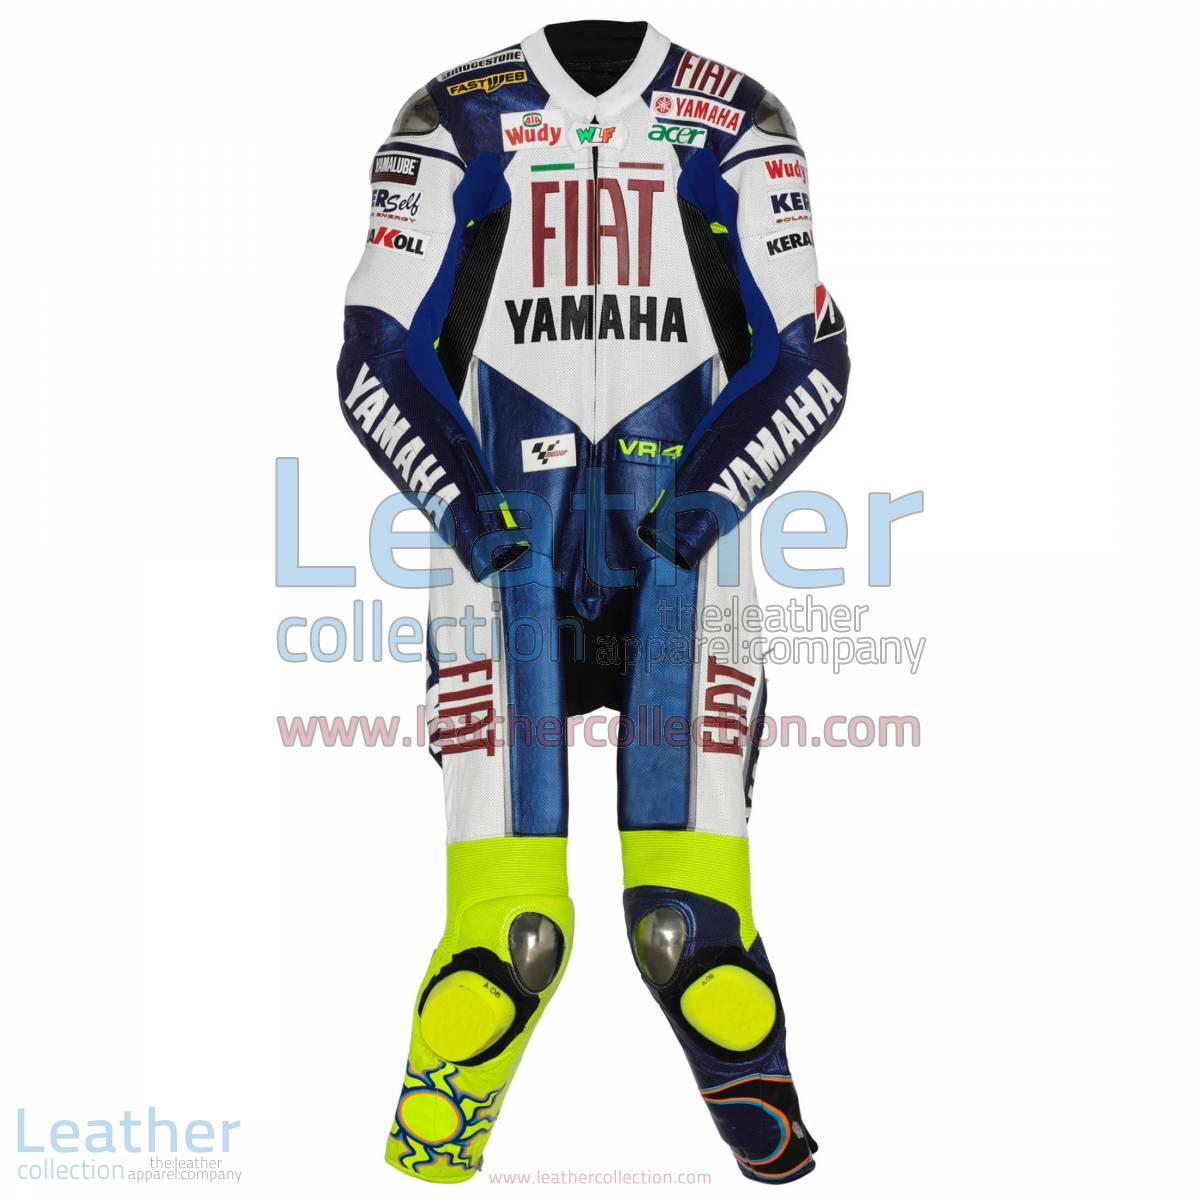 Valentino Rossi Yamaha Fiat MotoGP 2008 Racing Suit | valentino rossi racing suit